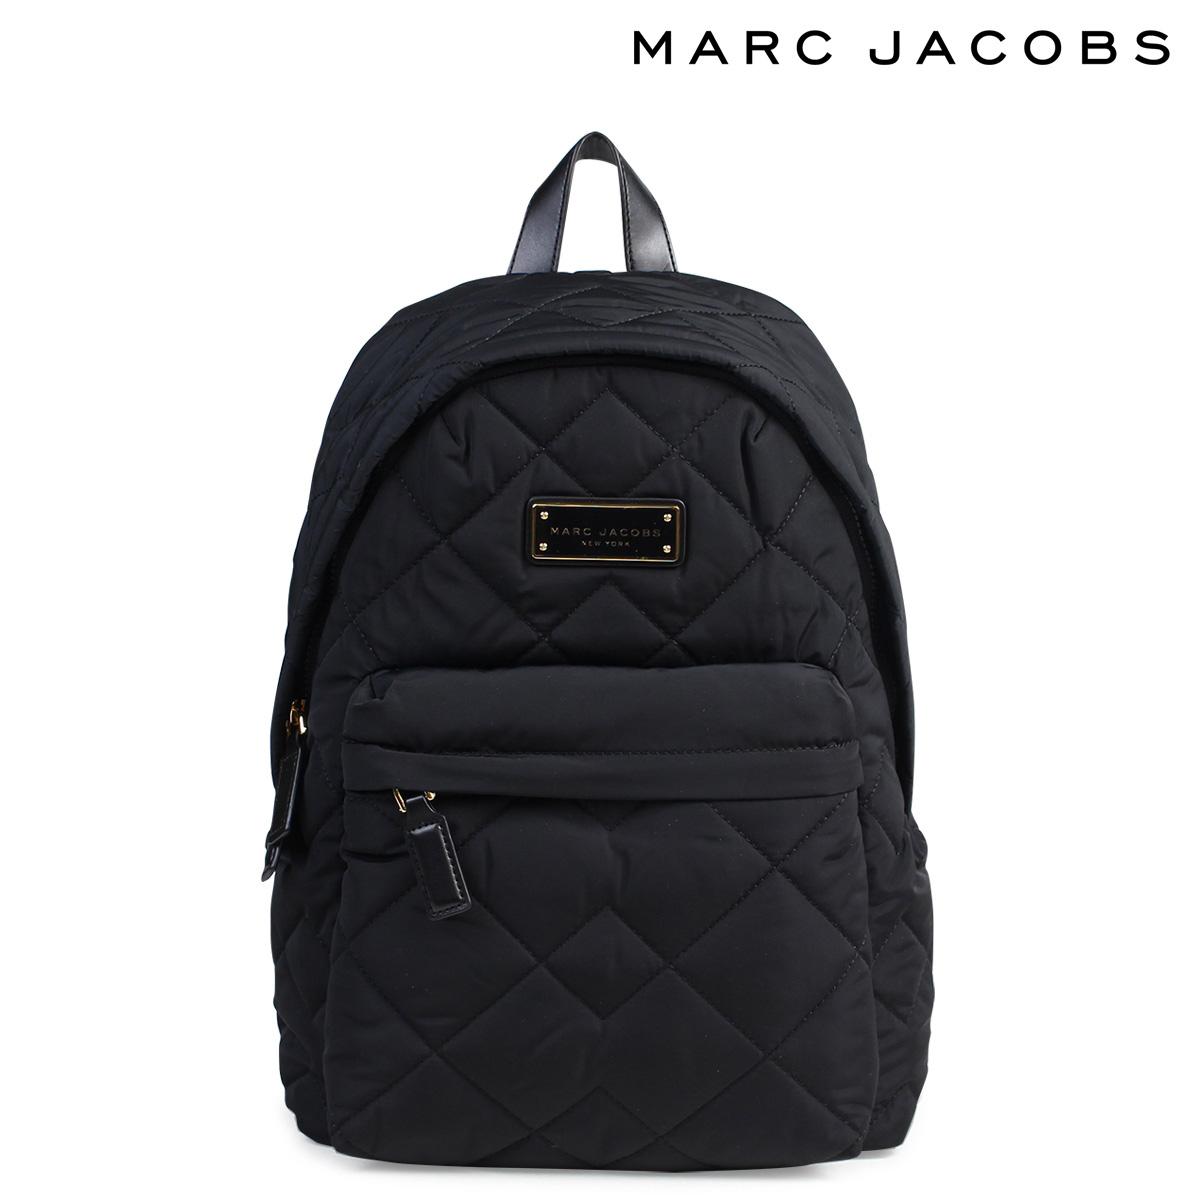 f650c0008 Sugar Online Shop: MARC JACOBS mark Jacobs bag rucksack backpack Lady's QUILTED  BACKPACK black black M0011321 [the 5/1 additional arrival] | Rakuten Global  ...